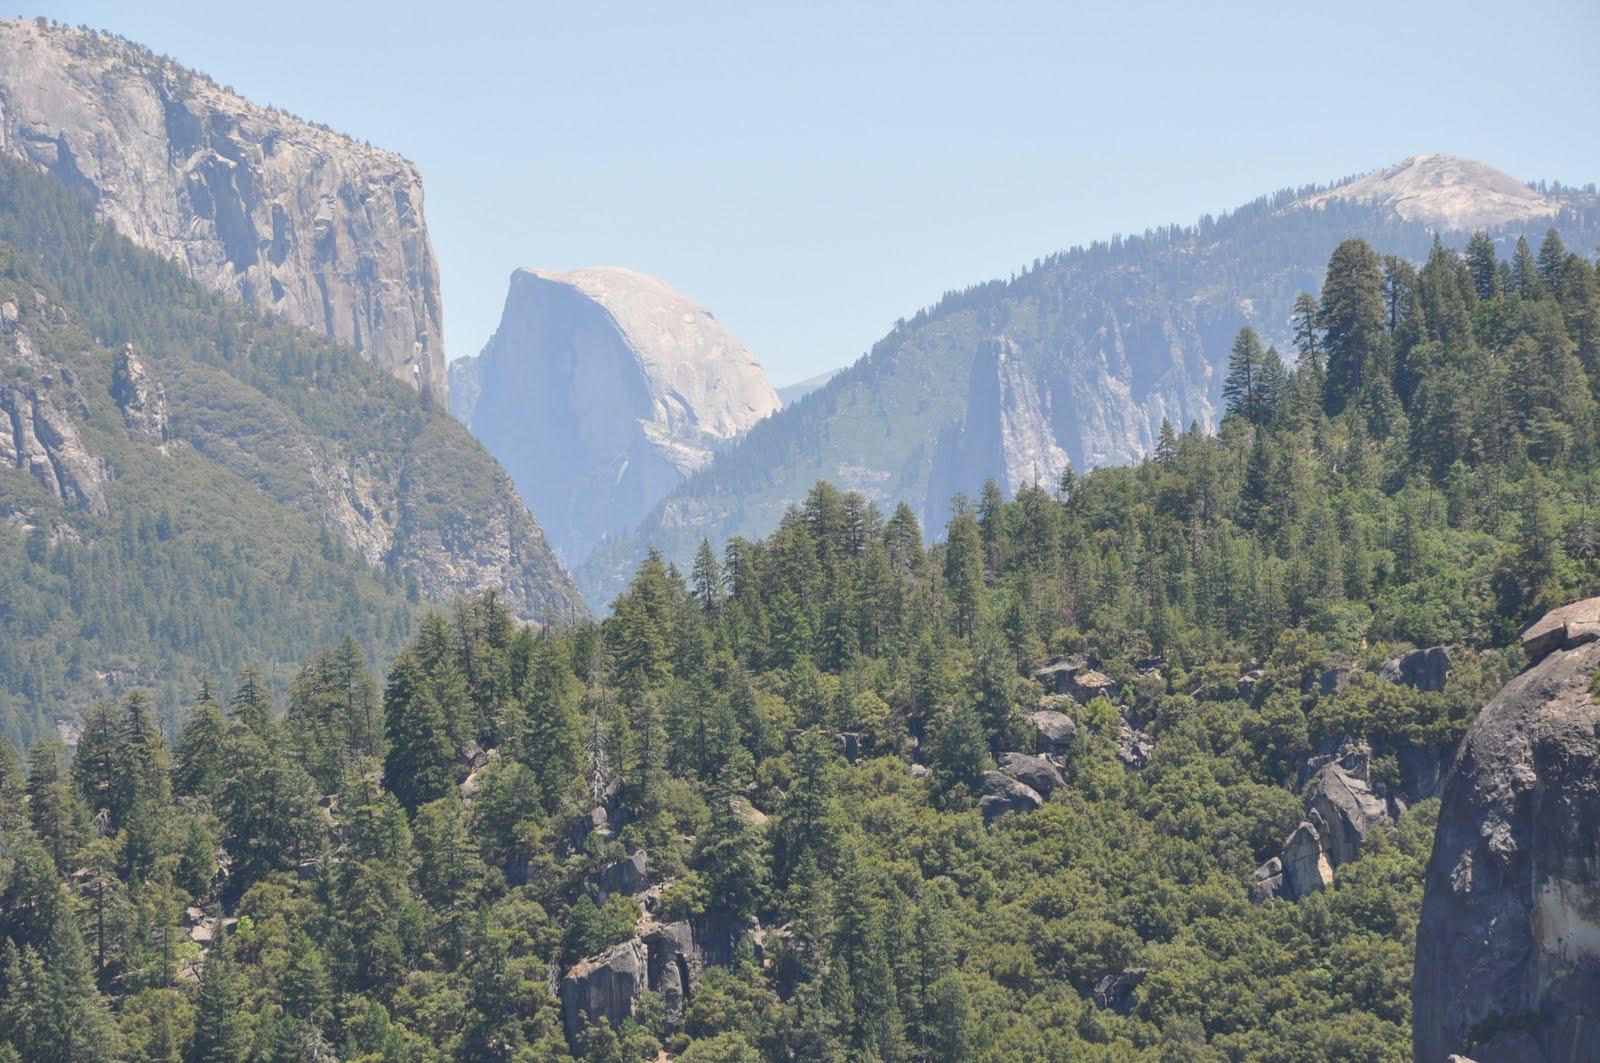 Murderous Musings: Ah, Yosemite